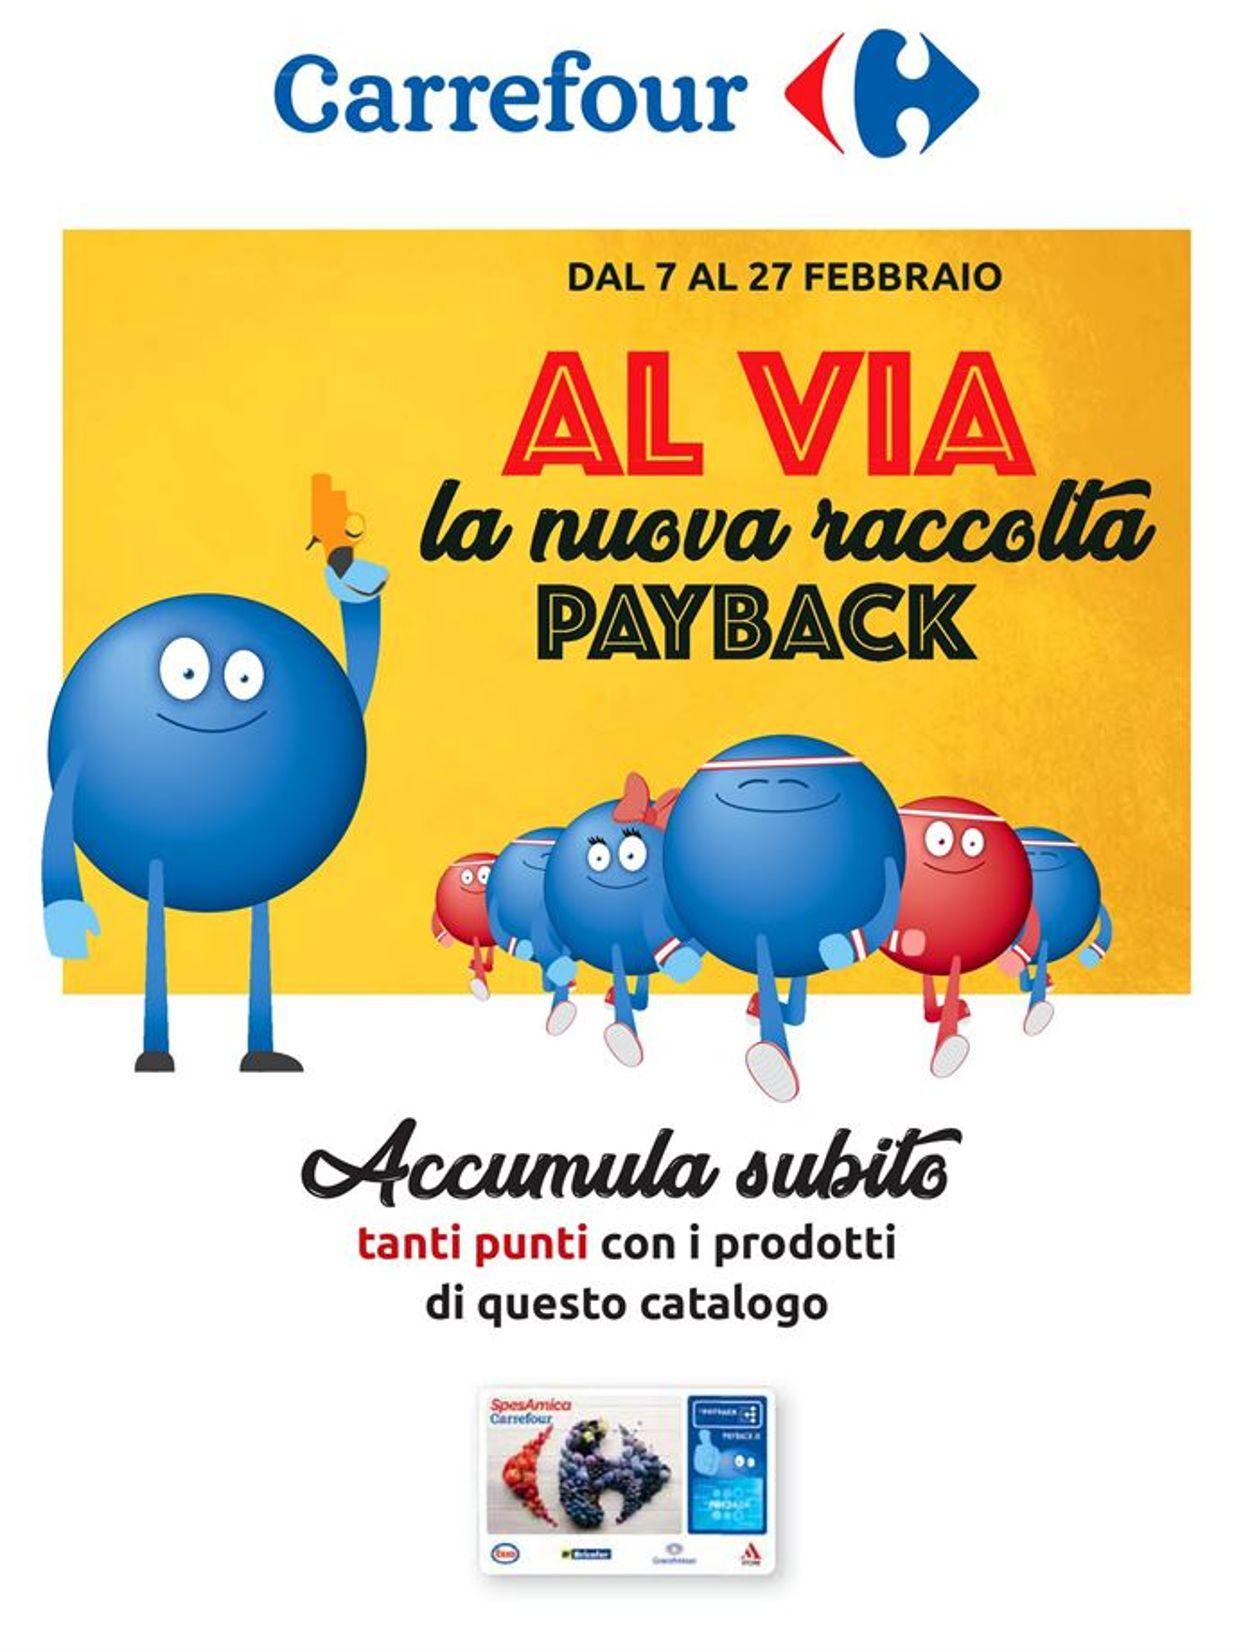 Volantino Carrefour - Offerte 07/02-27/02/2020